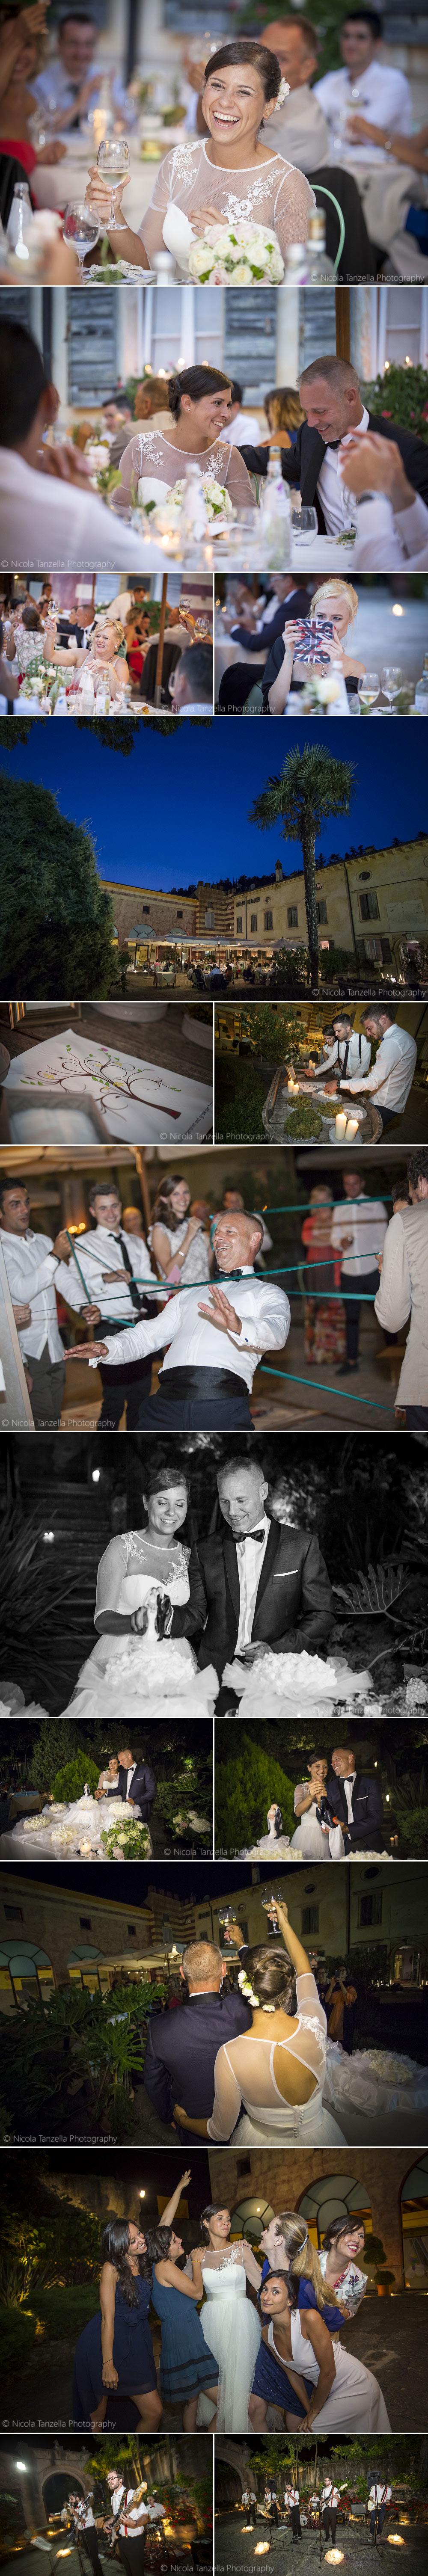 wedding in verona -8